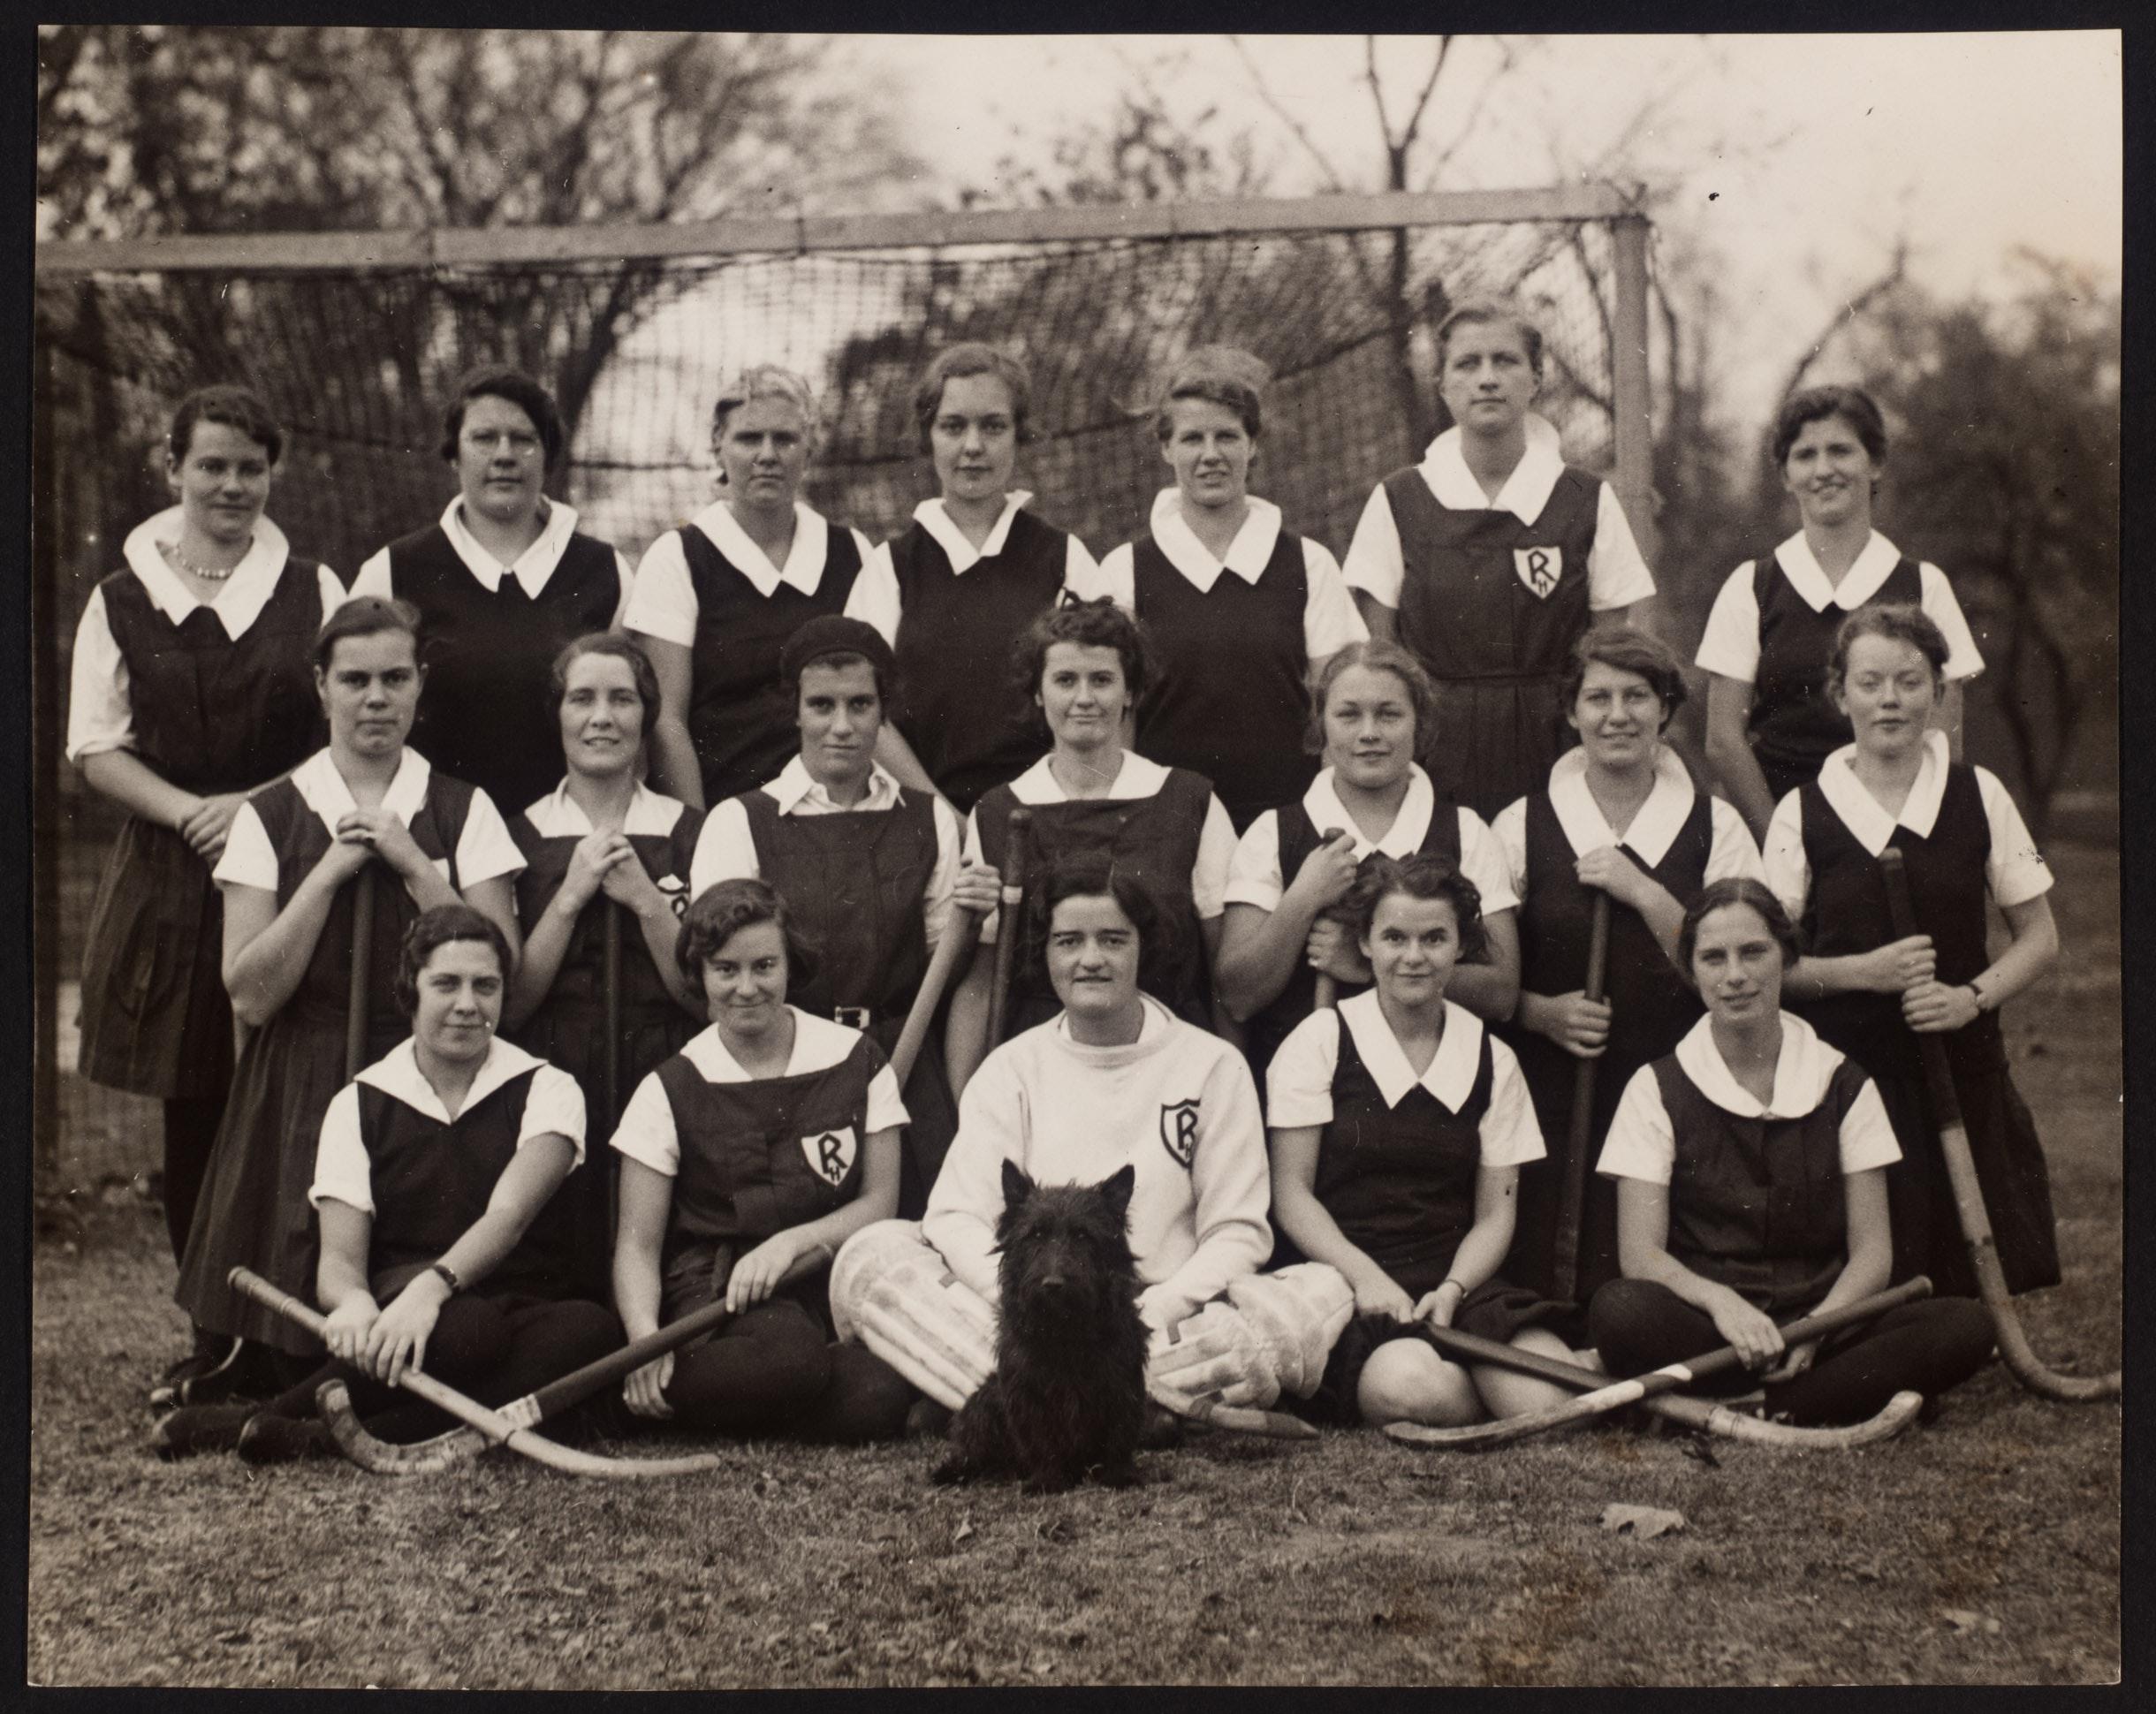 Radcliffe College Field Hockey Team